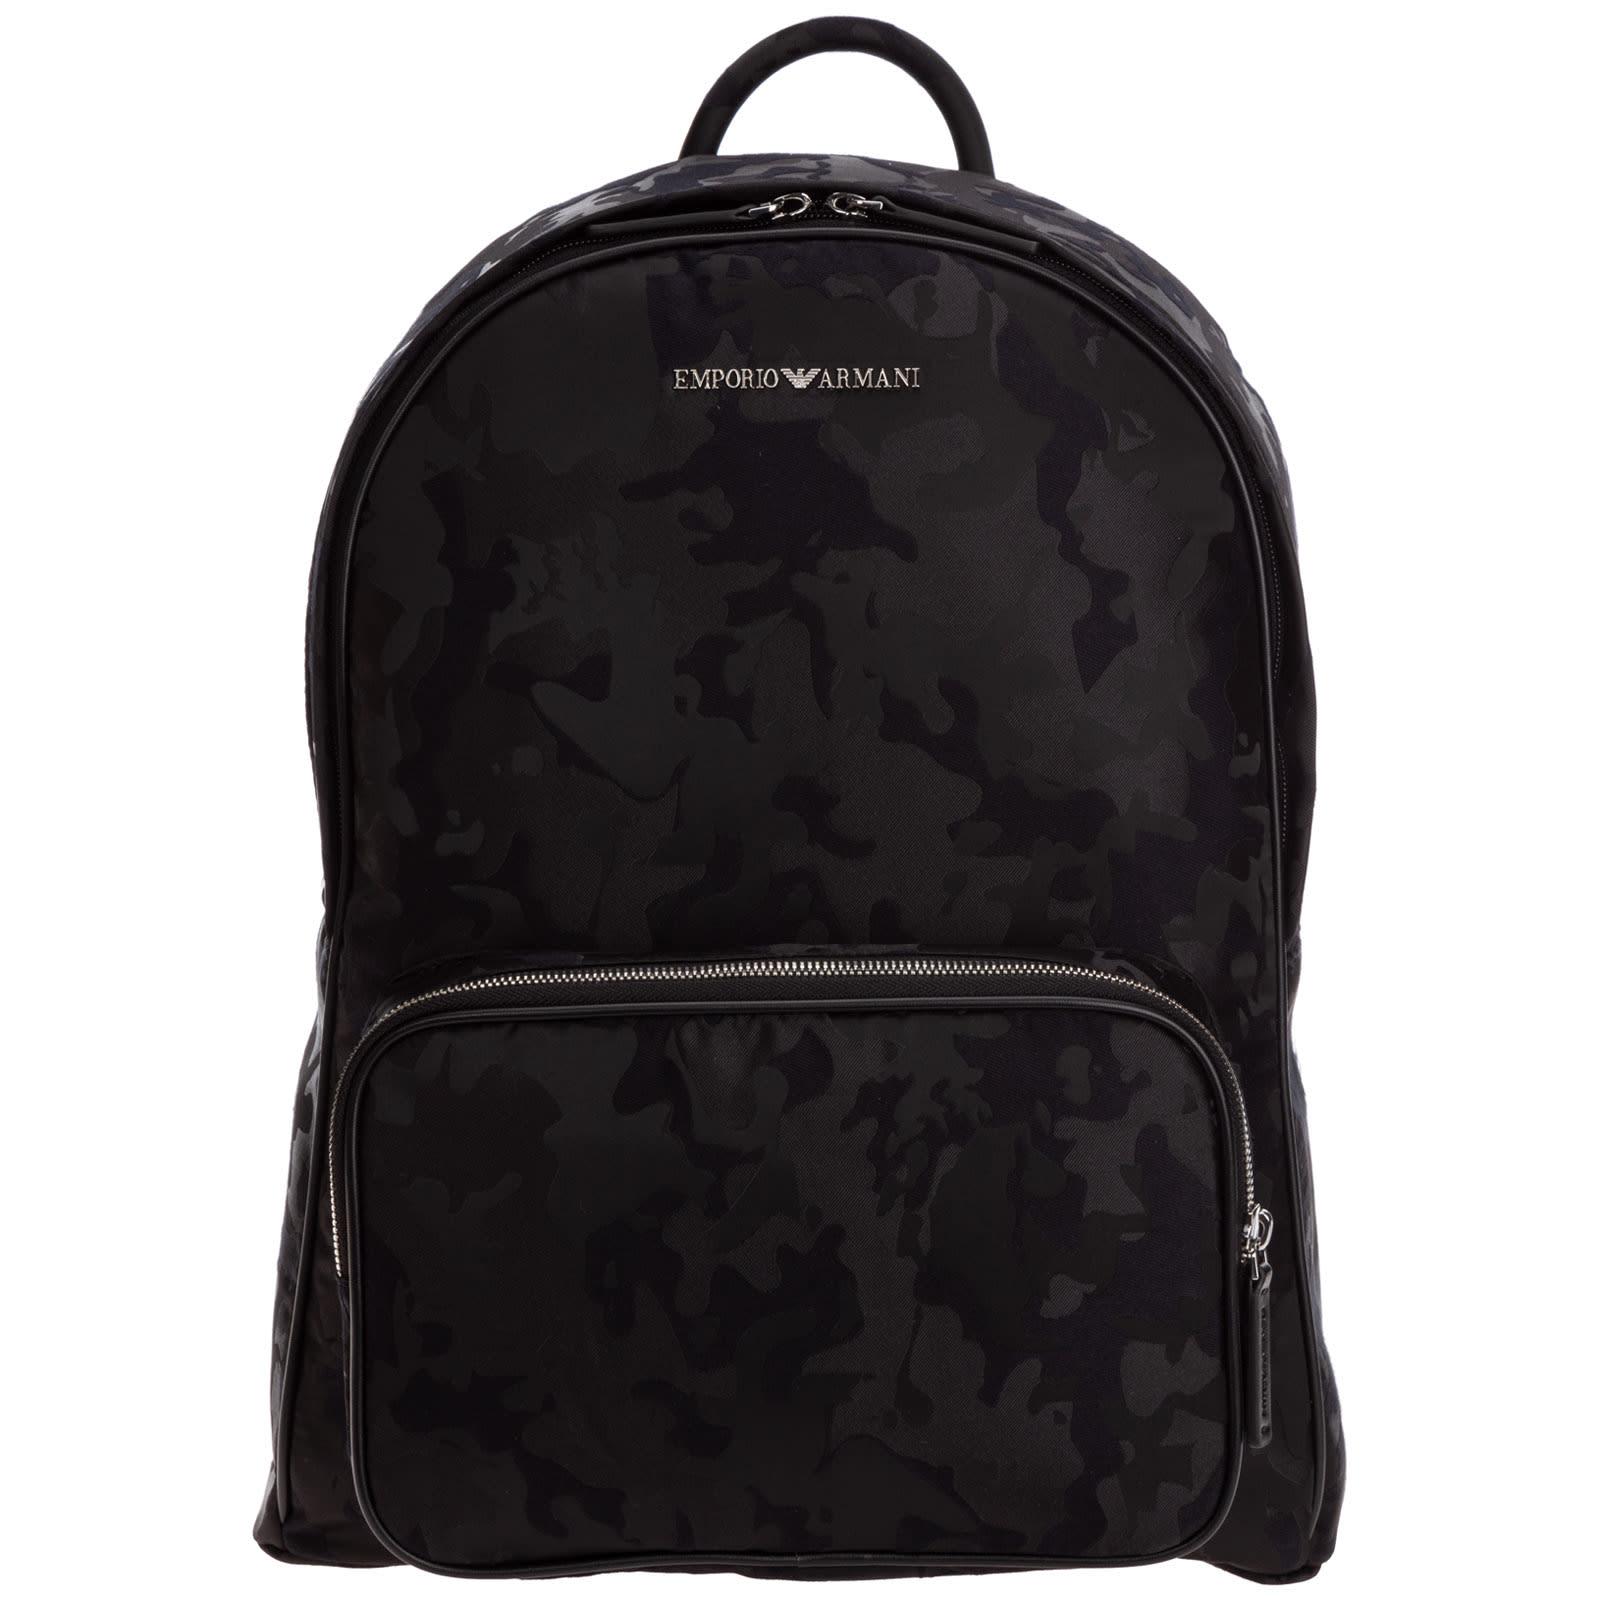 Emporio Armani Tuscan Leather Backpack